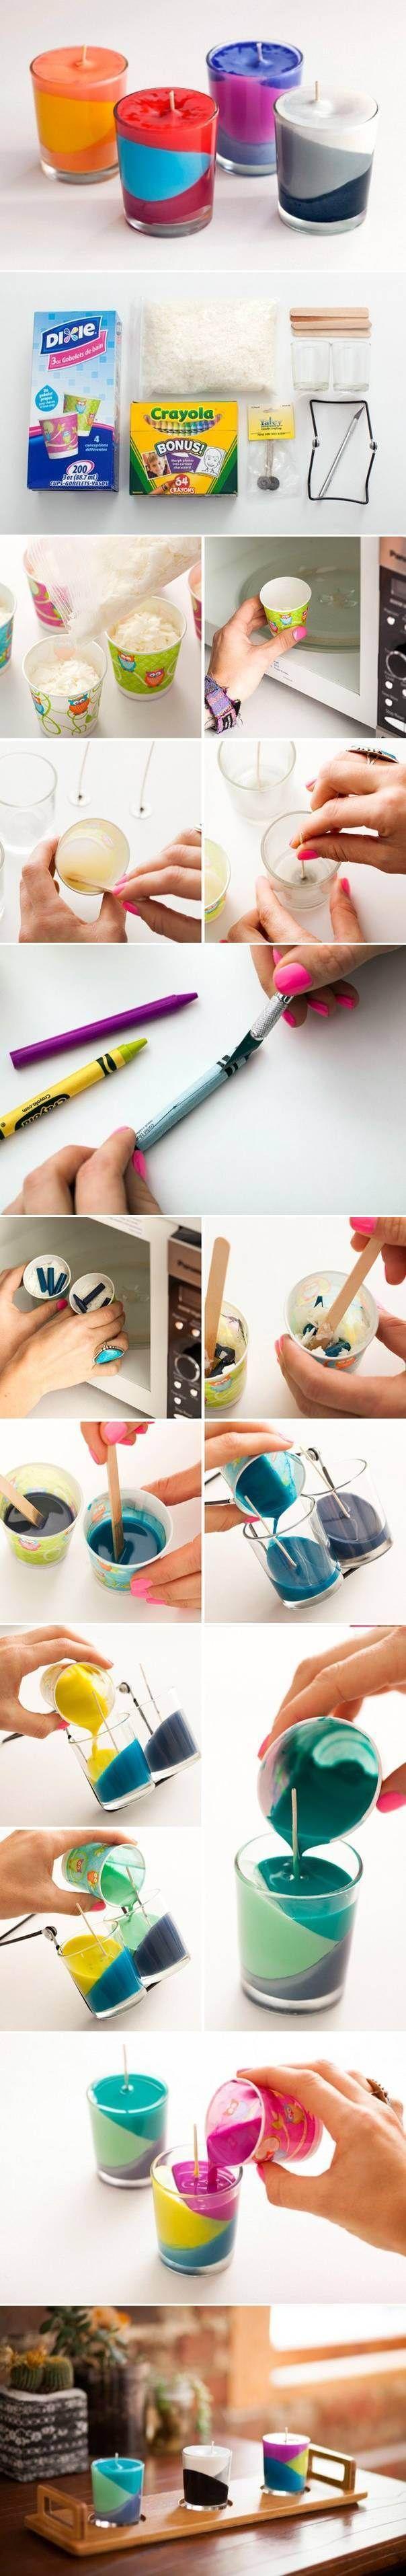 DIY Multicolor Candle from Crayons | #DIY perfect velas